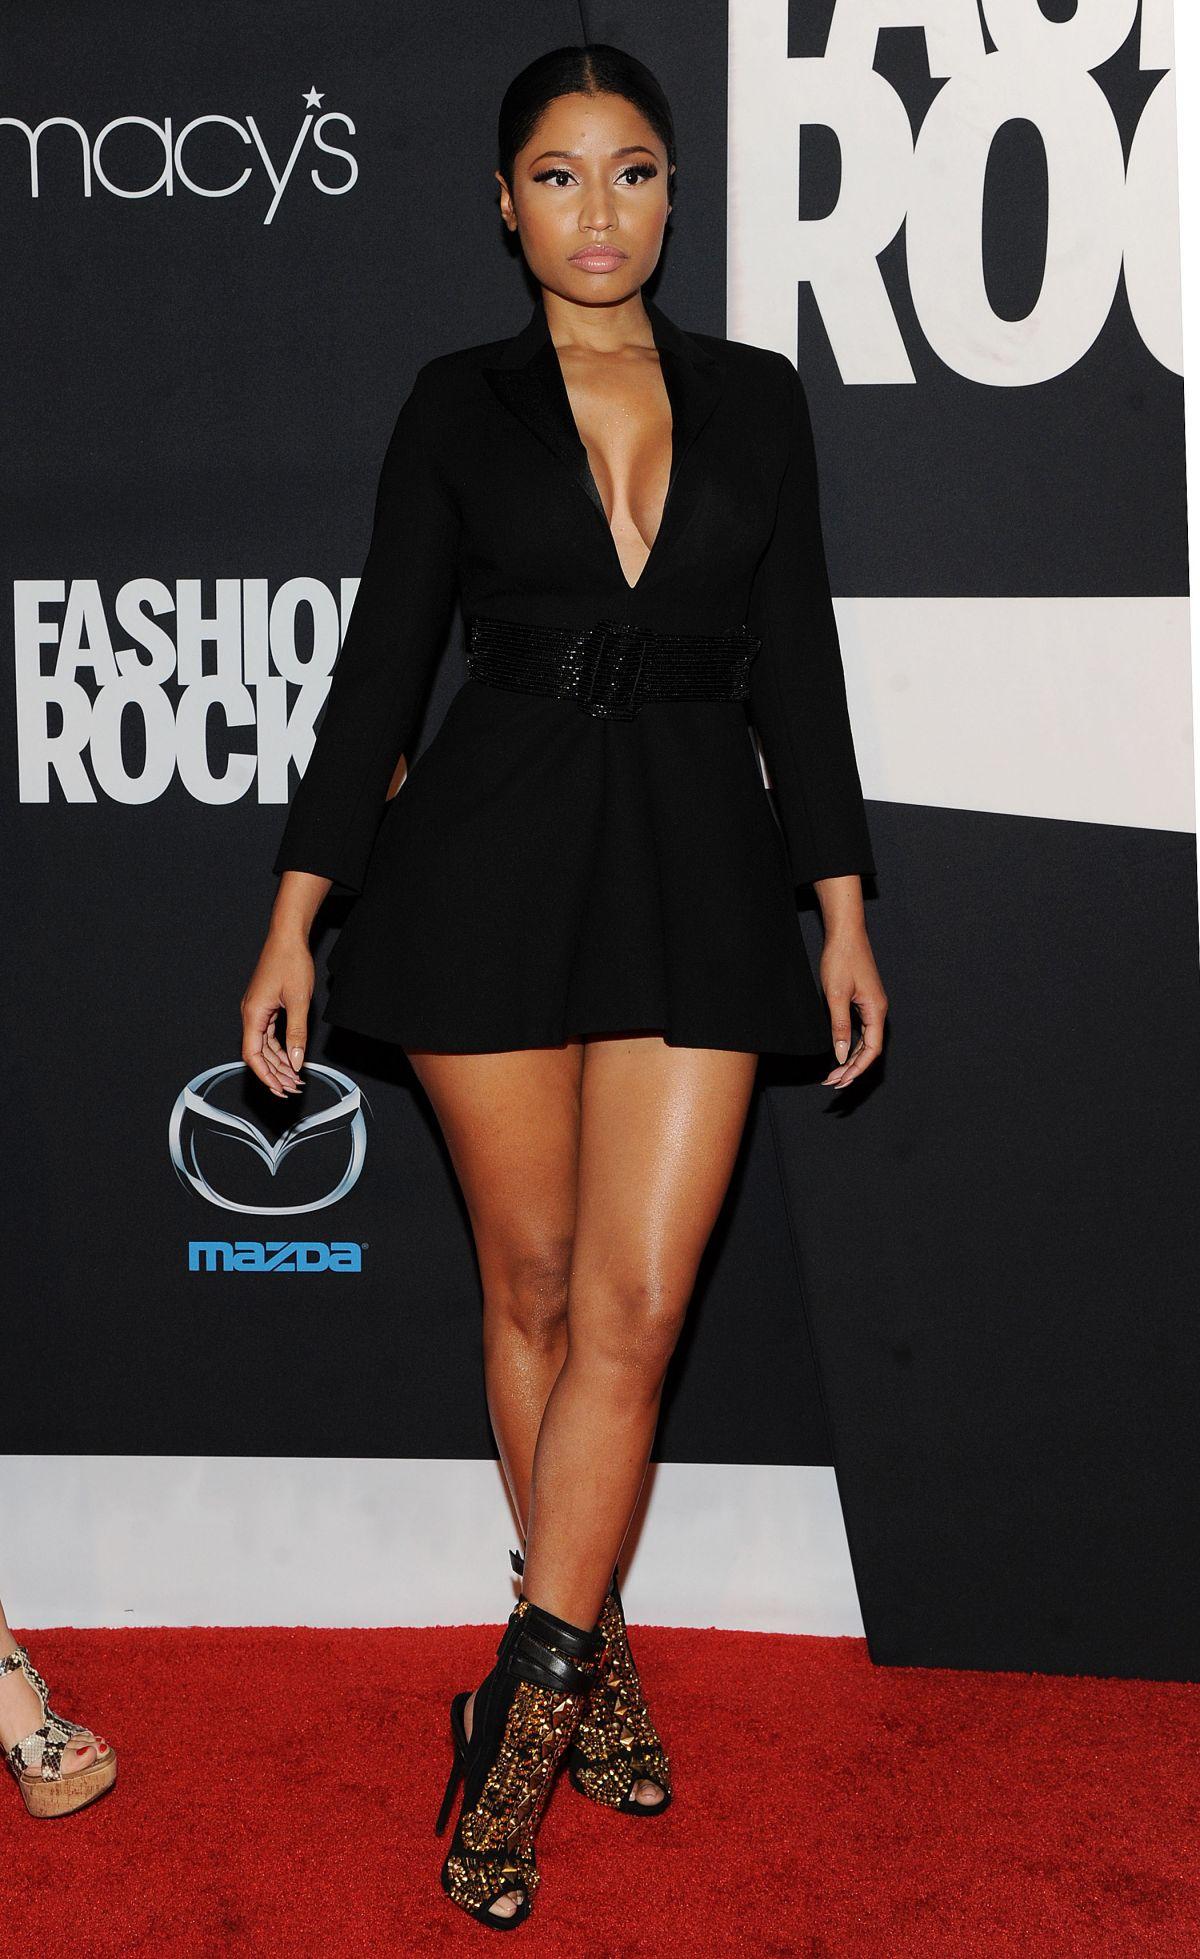 Nicki Minaj At Fashion Rocks 2014 In New York Hawtcelebs